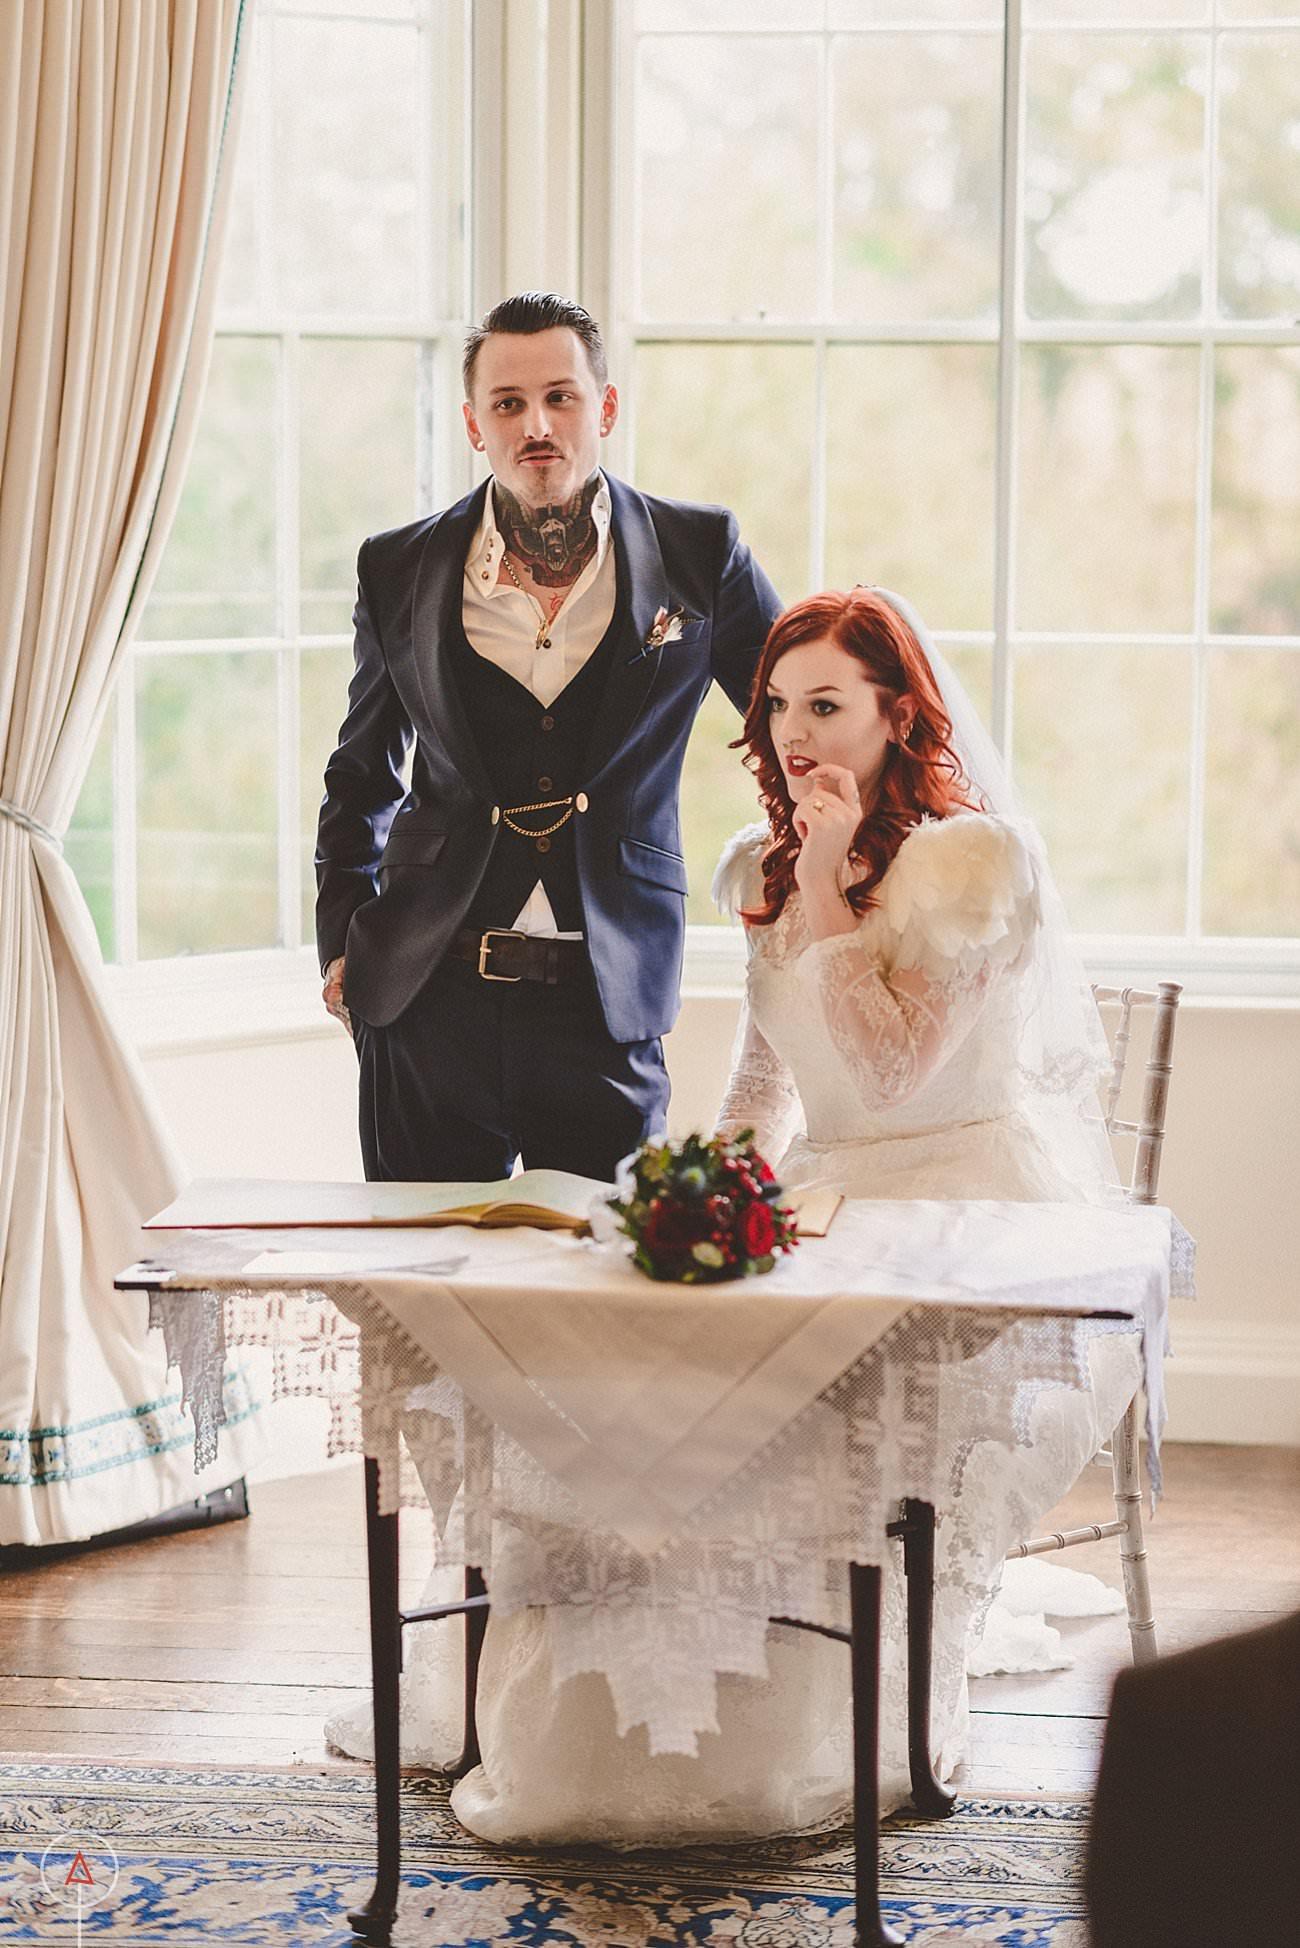 fonmon-castle-wedding-photographer-Cardiff_0161